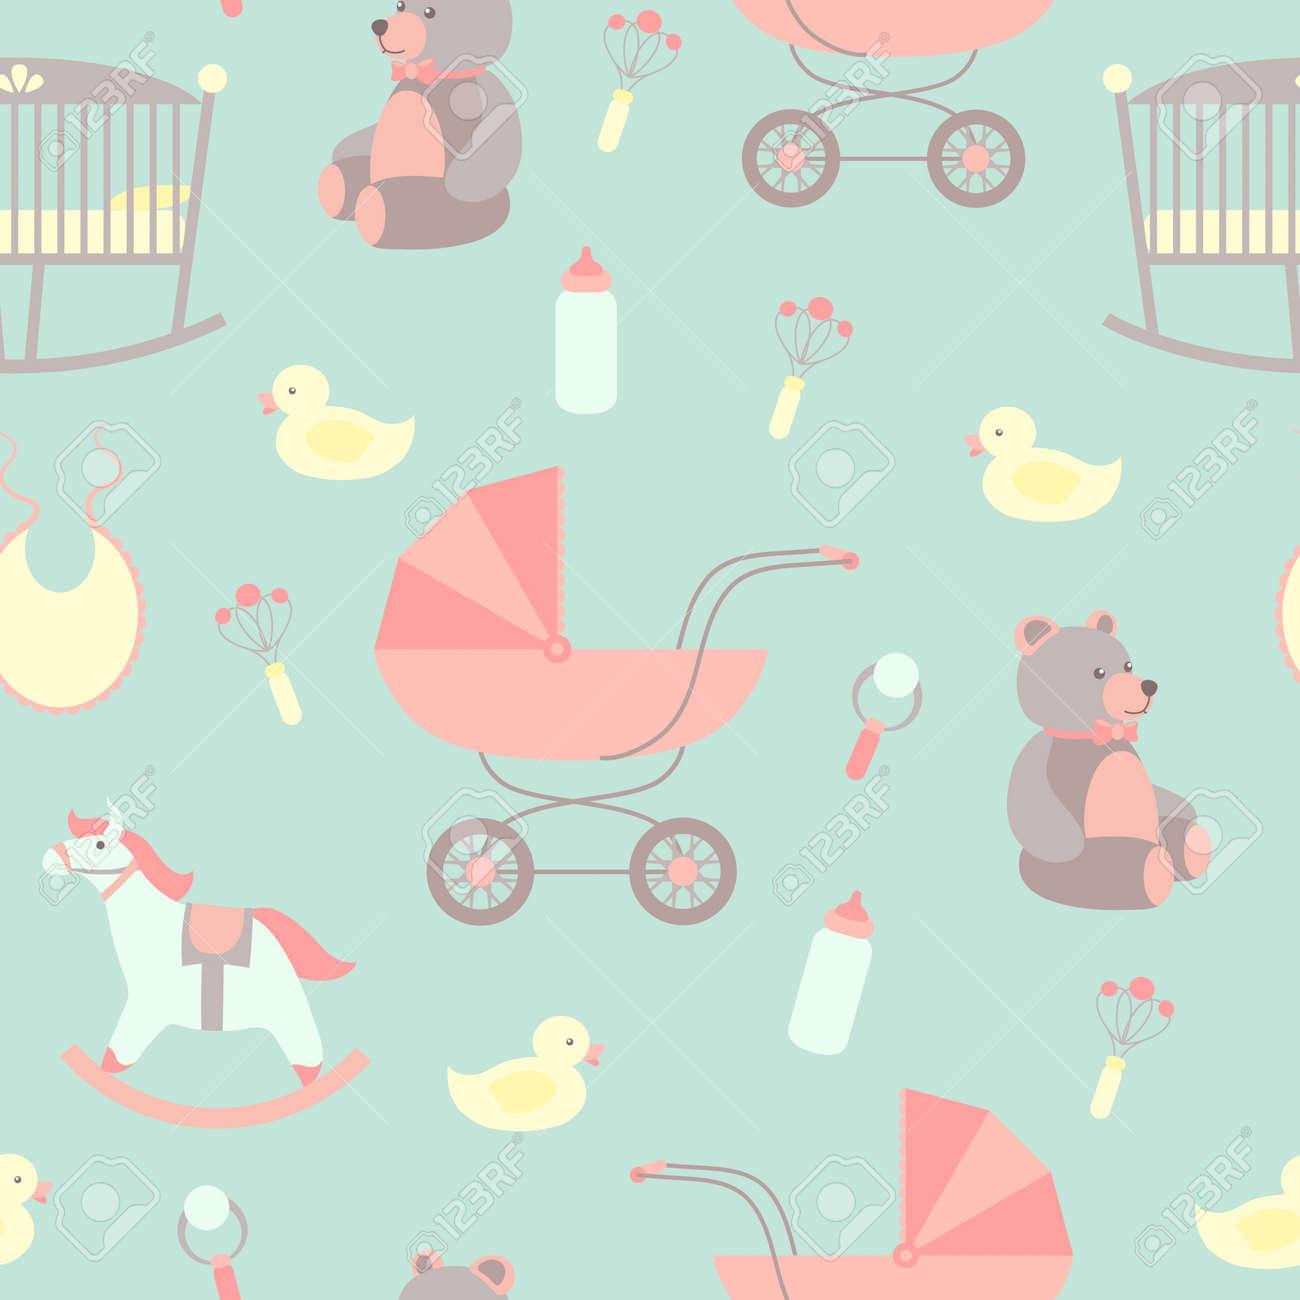 baby background wallpaper ✓ enam wallpaper